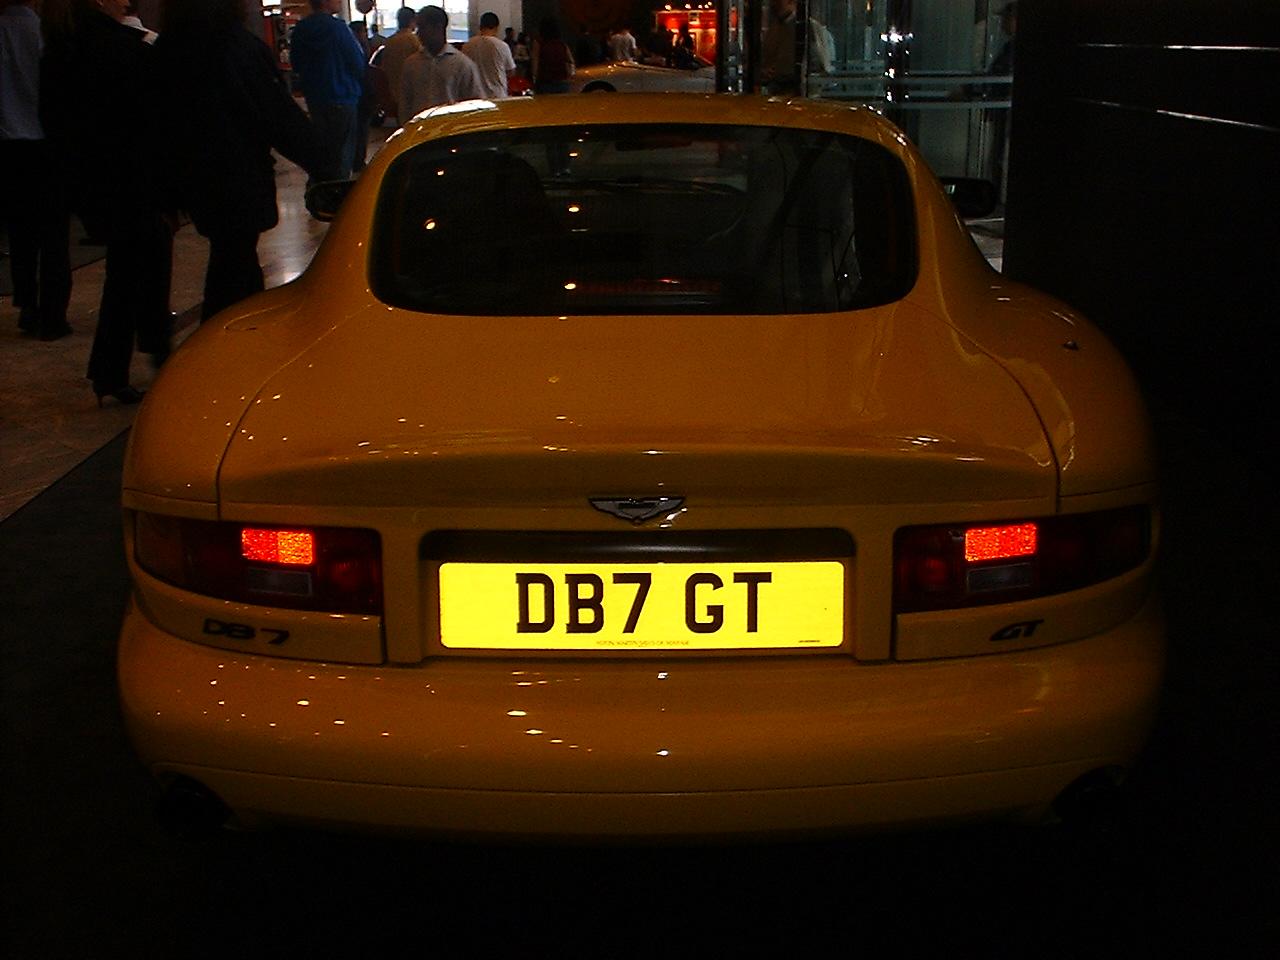 The Aston Martin DB7 GT.